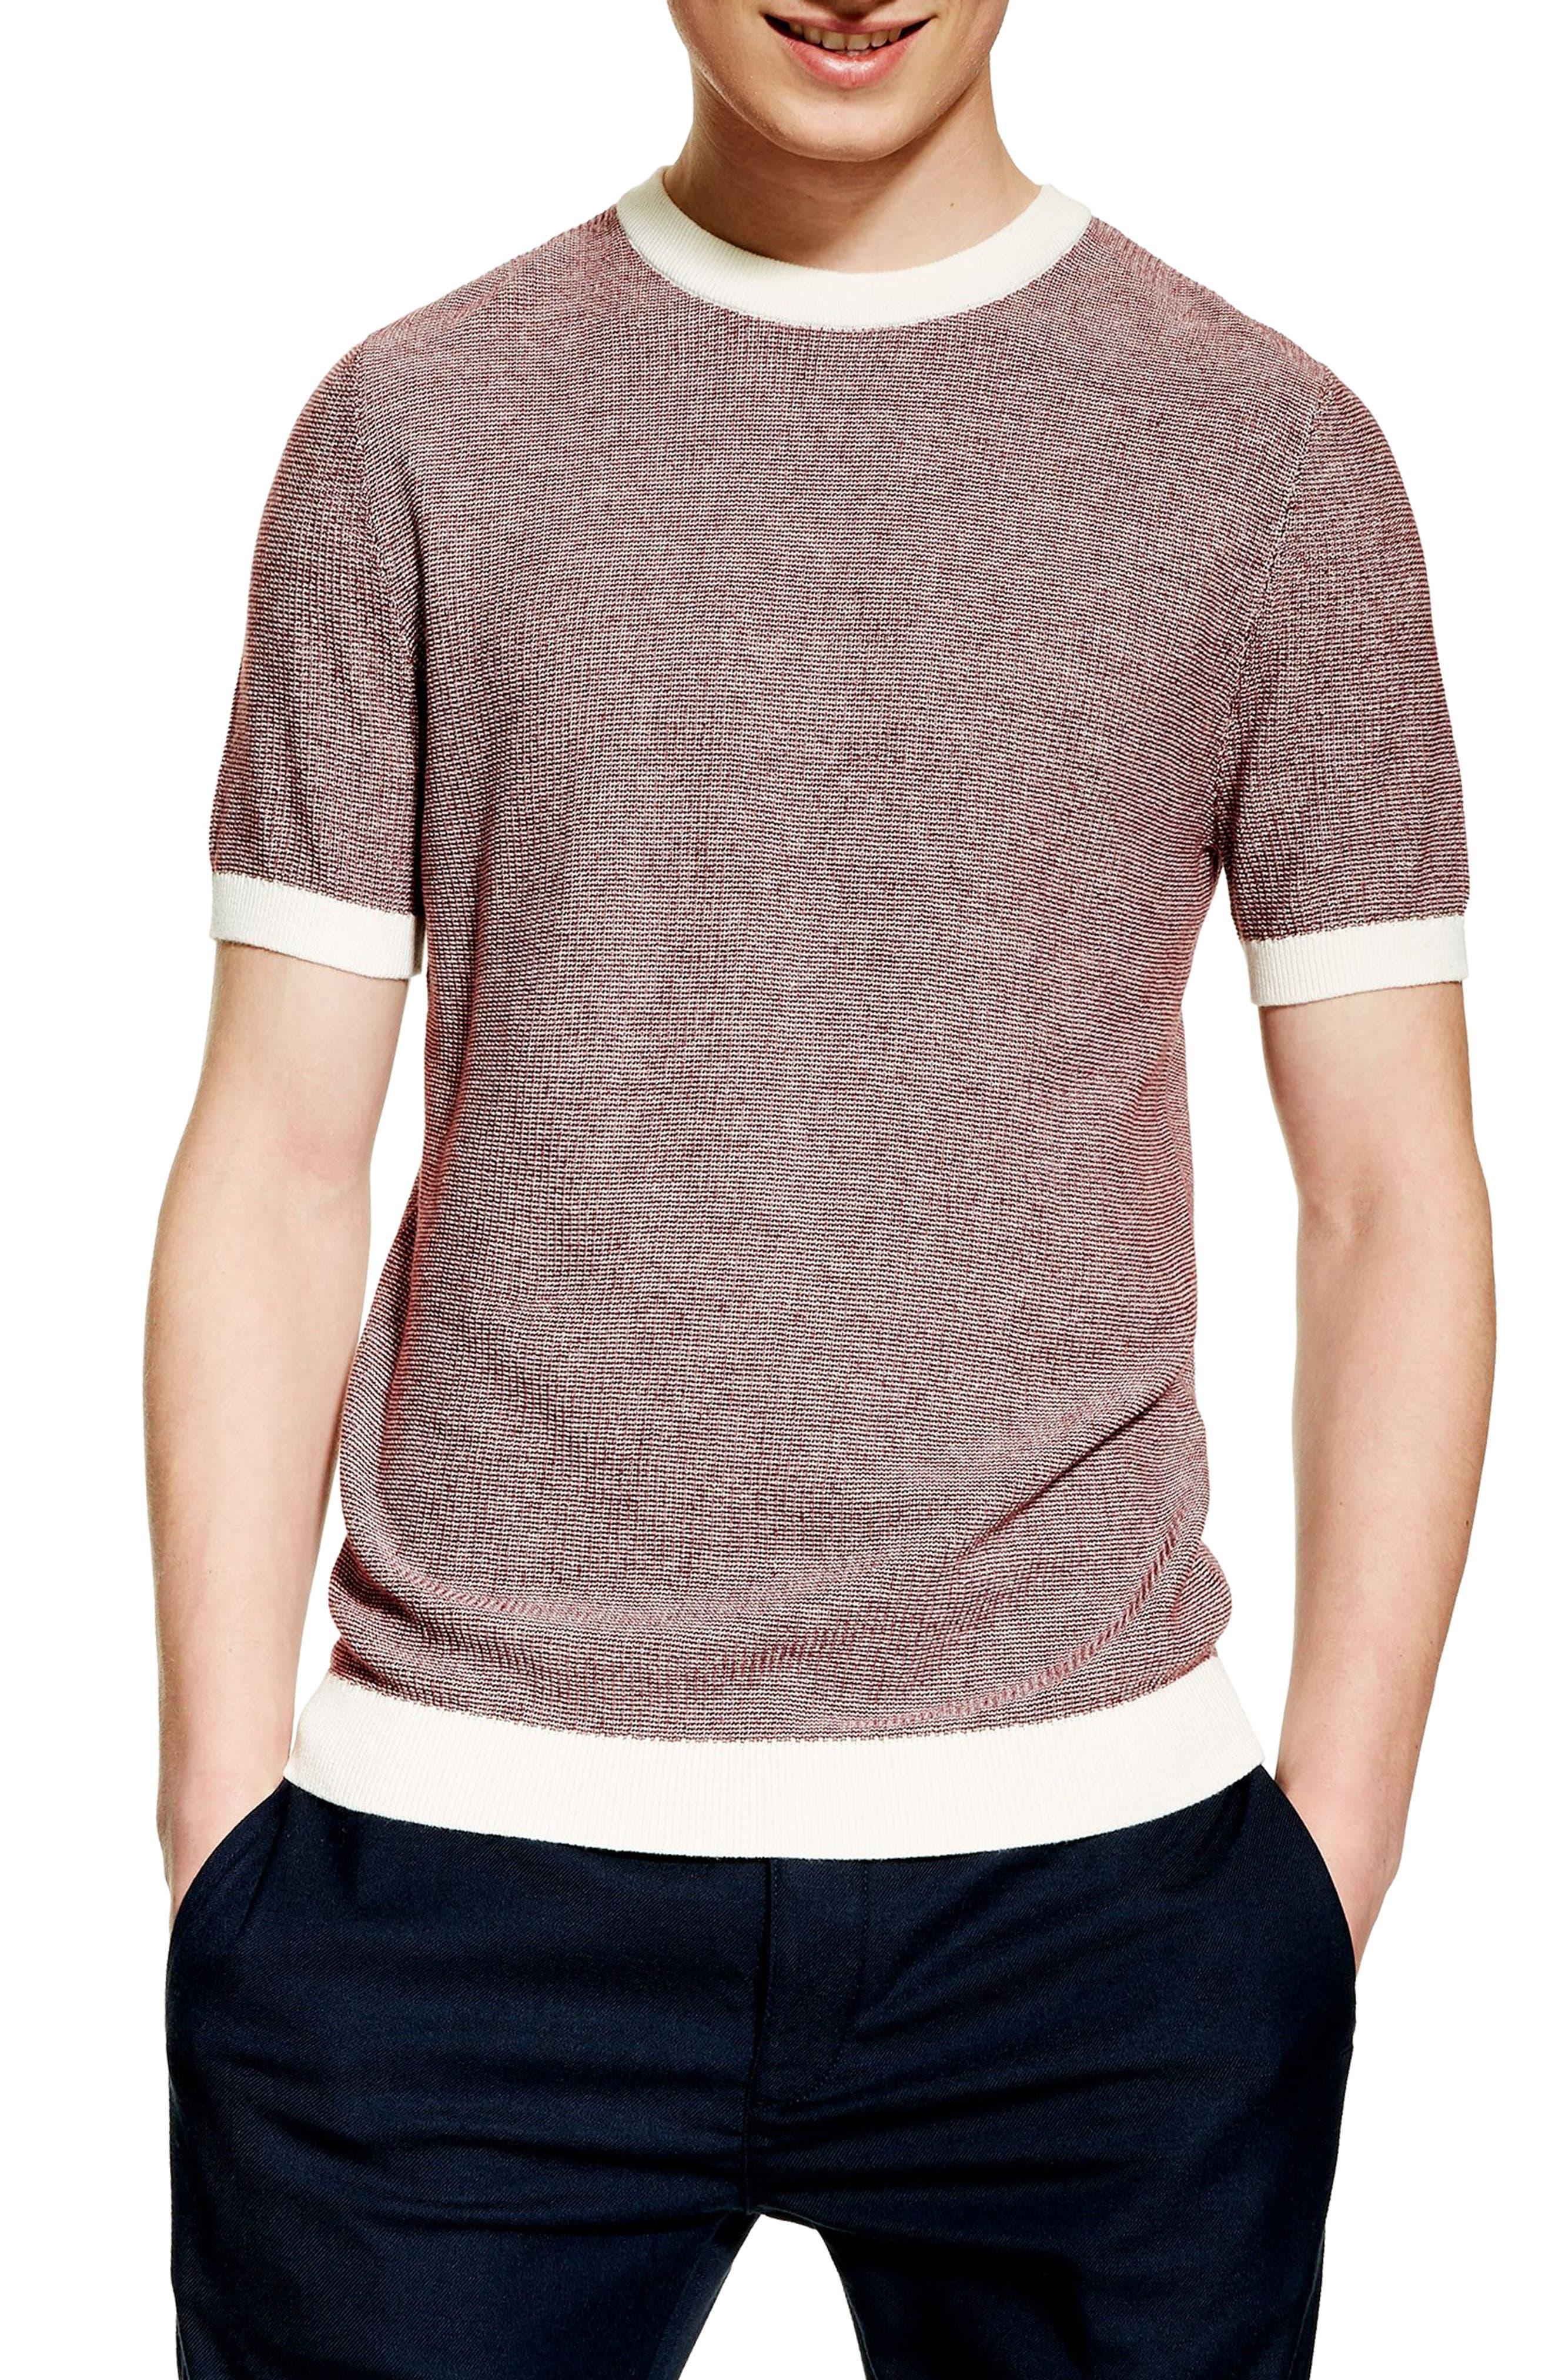 1930s Mens Shirts | Dress Shirts, Polo Shirts, Work Shirts Mens Topman Short Sleeve Sweater T-Shirt Size X-Small - Burgundy $45.00 AT vintagedancer.com